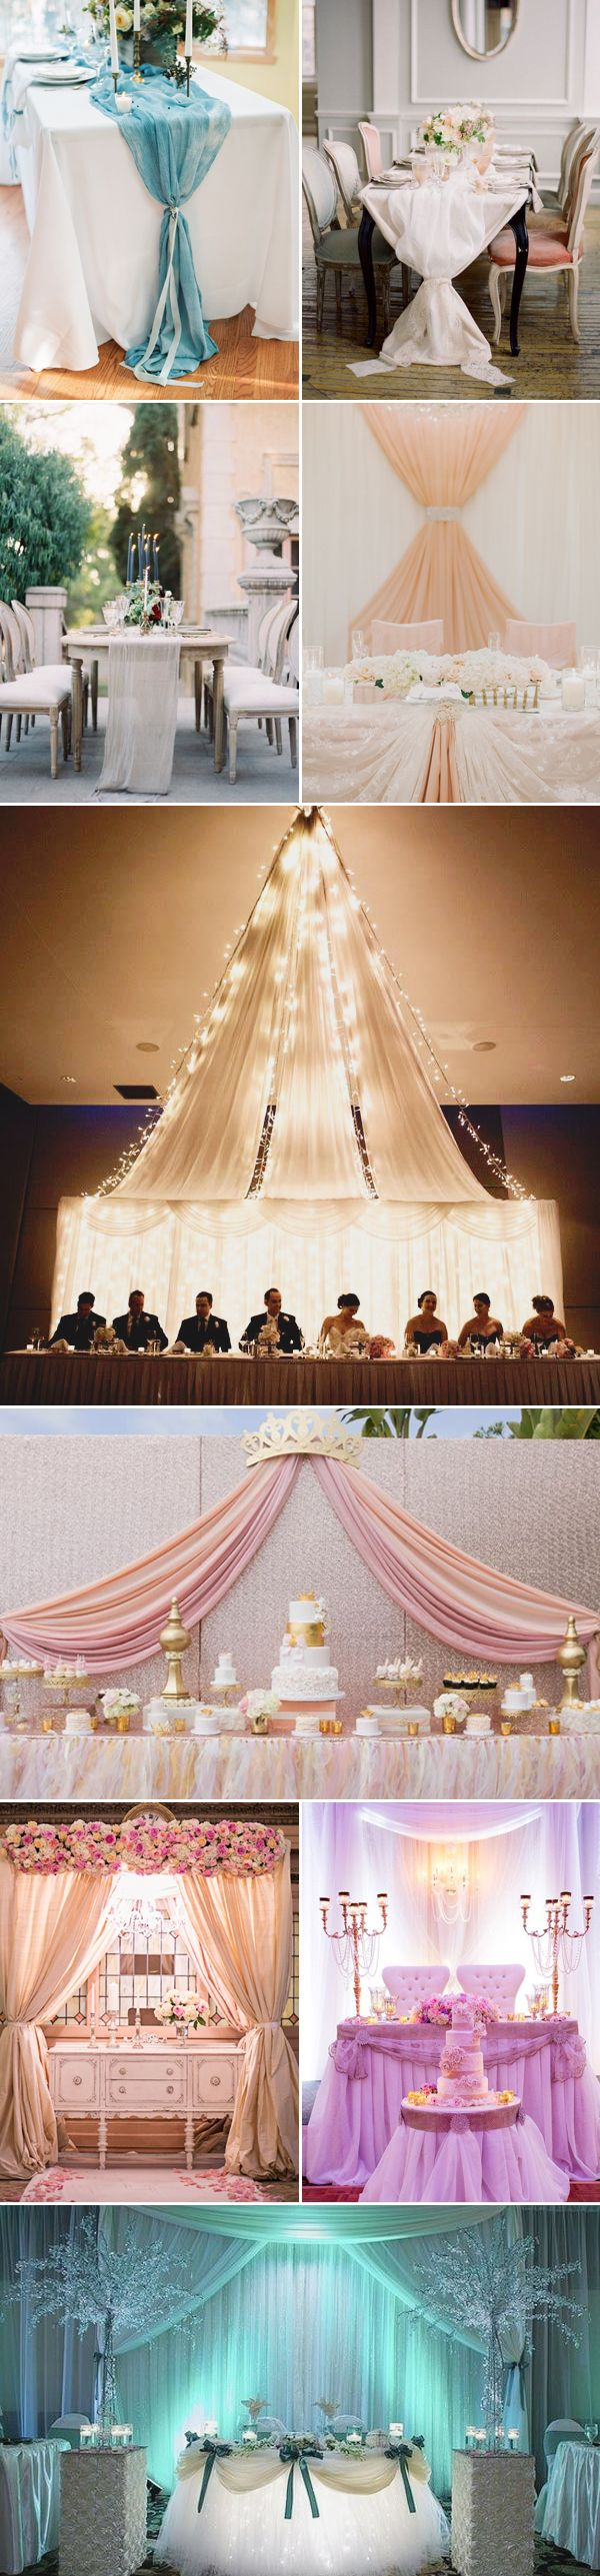 Ideas of wedding decorations   Romantic Drapery Decor Ideas to Stun Your Guests  Romantic